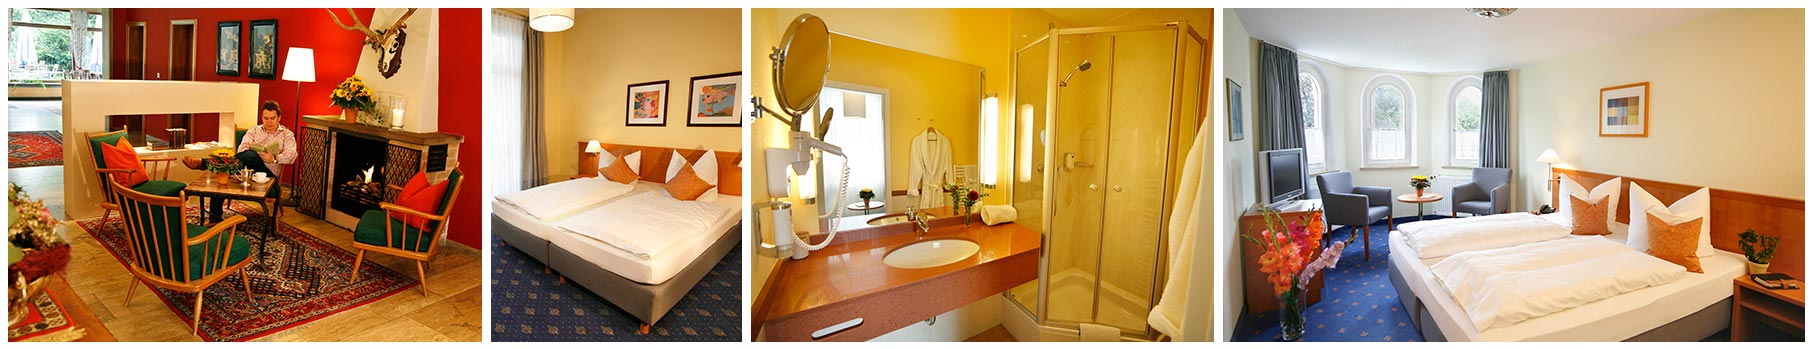 Hotel-Bad-Johannisbad-Zimmer